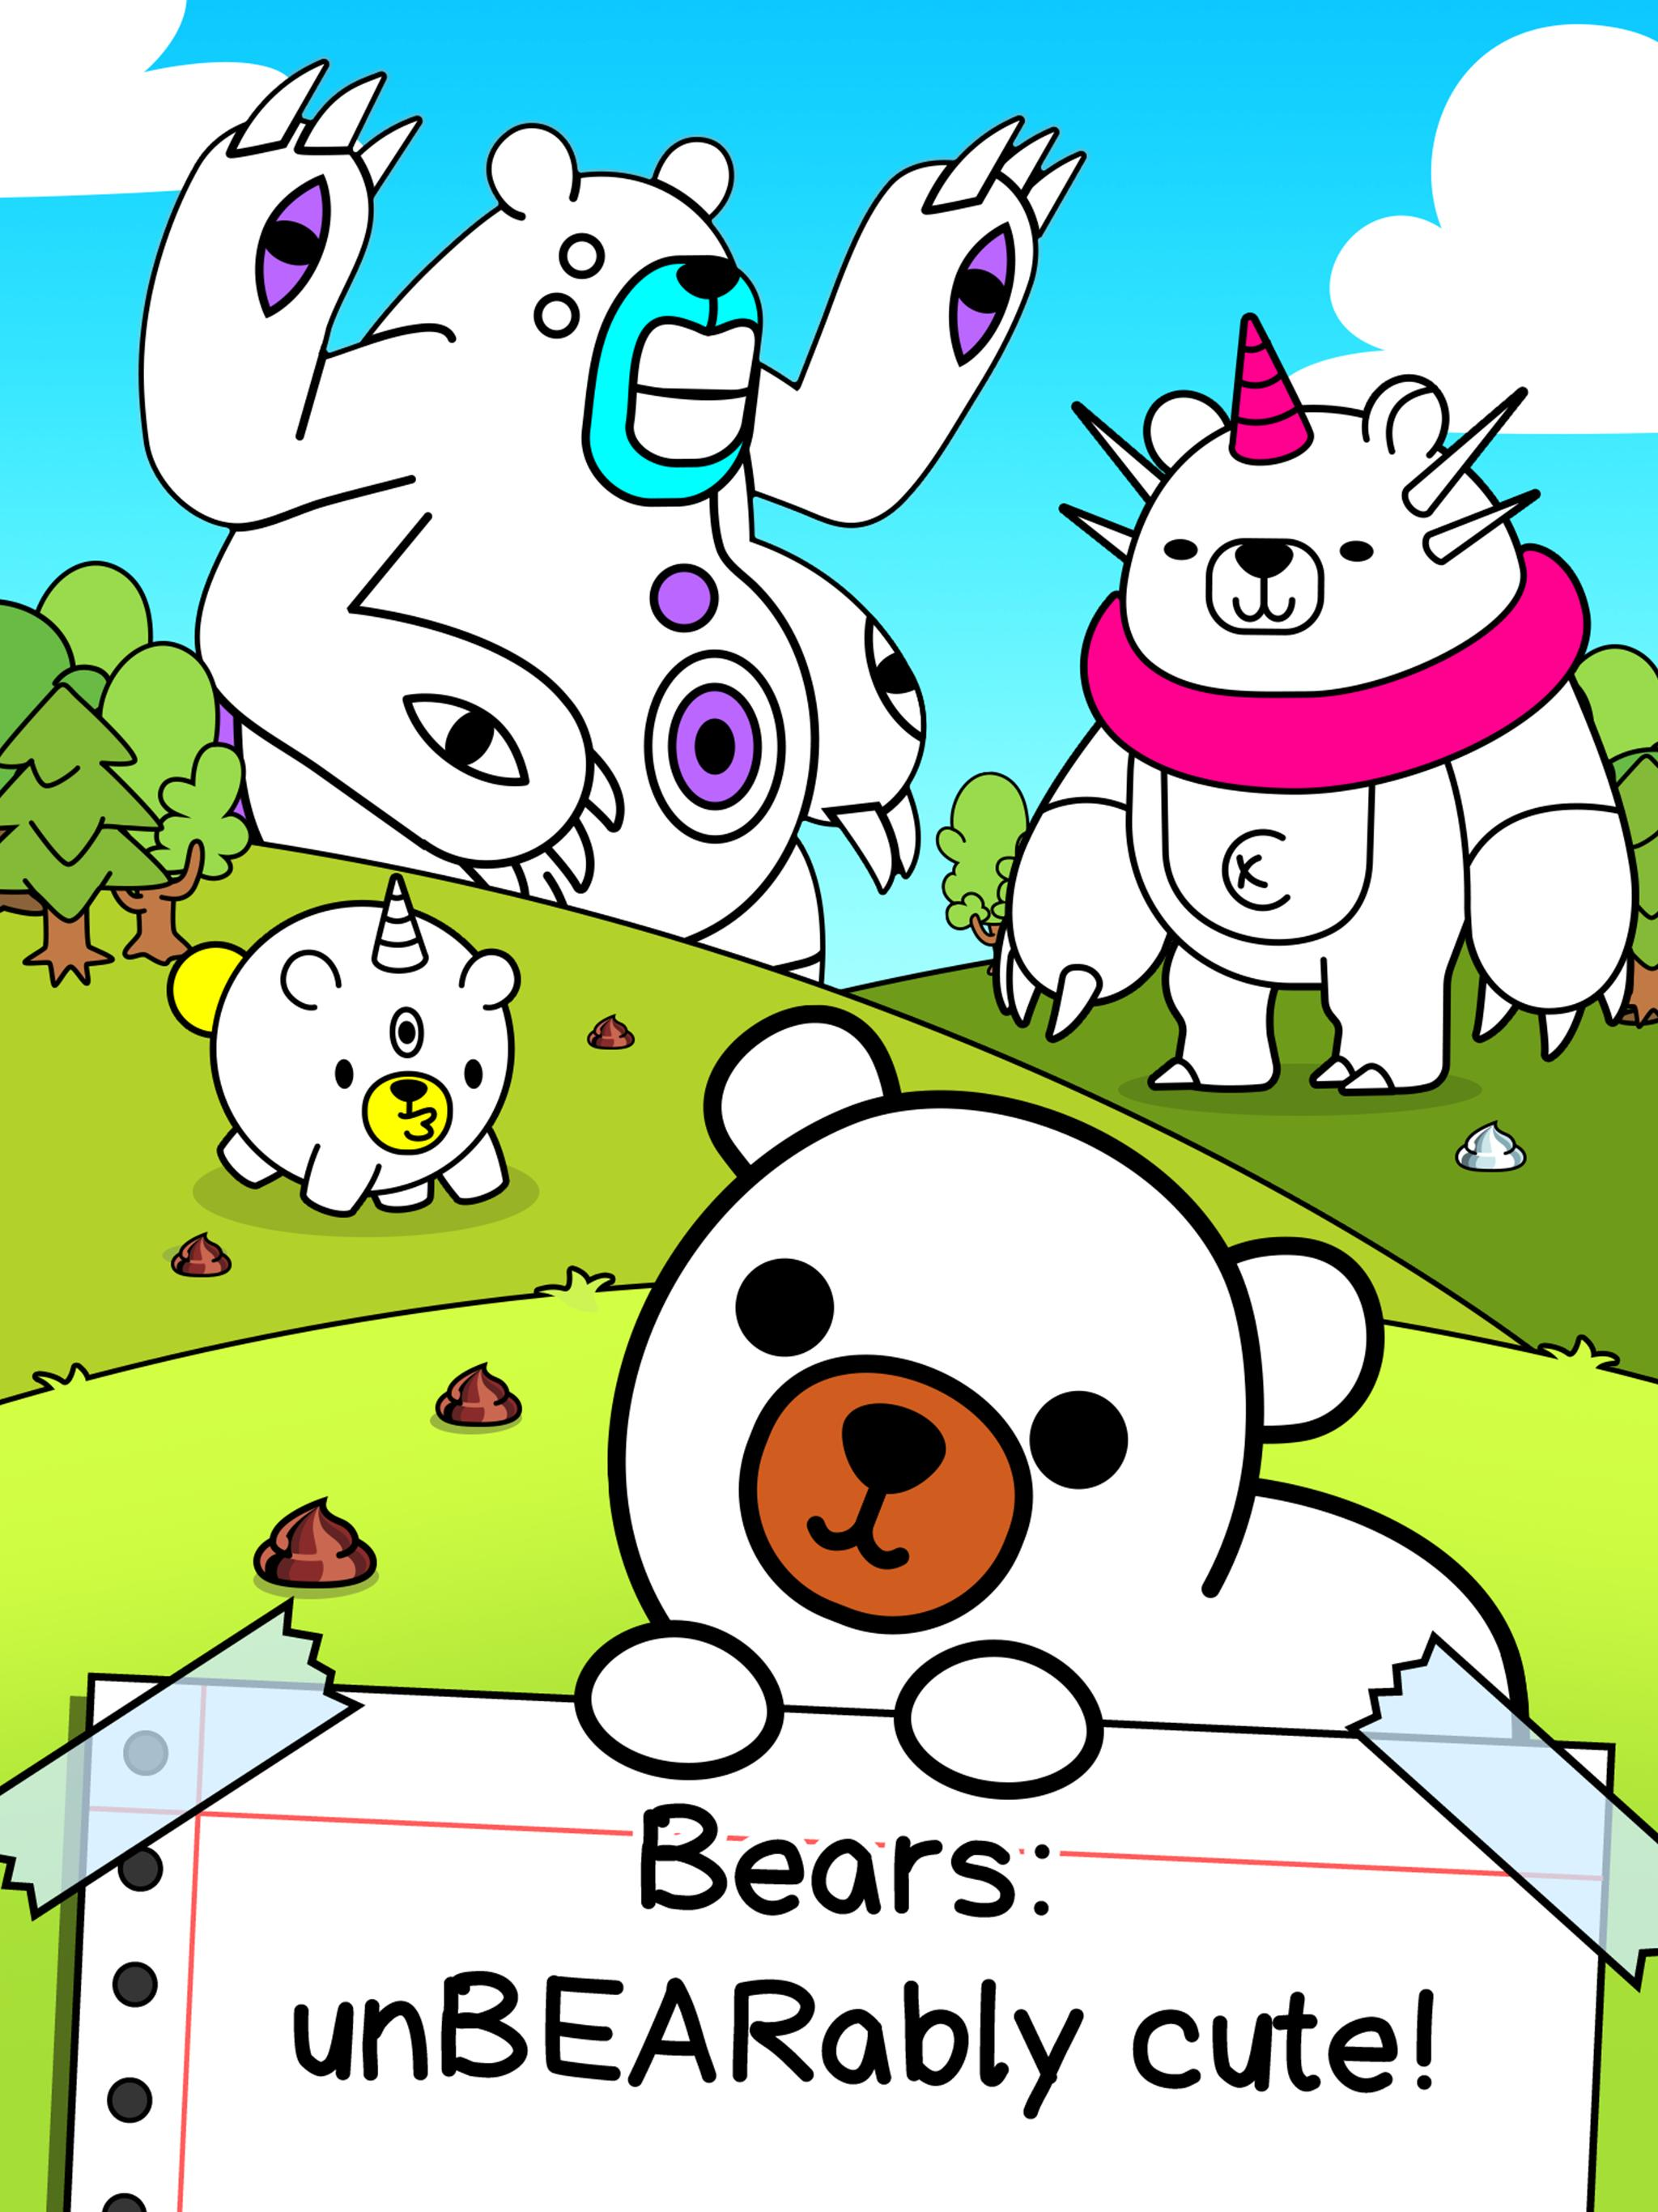 Bear Evolution UnBEARably Fun Clicker Game 1.0 Screenshot 5